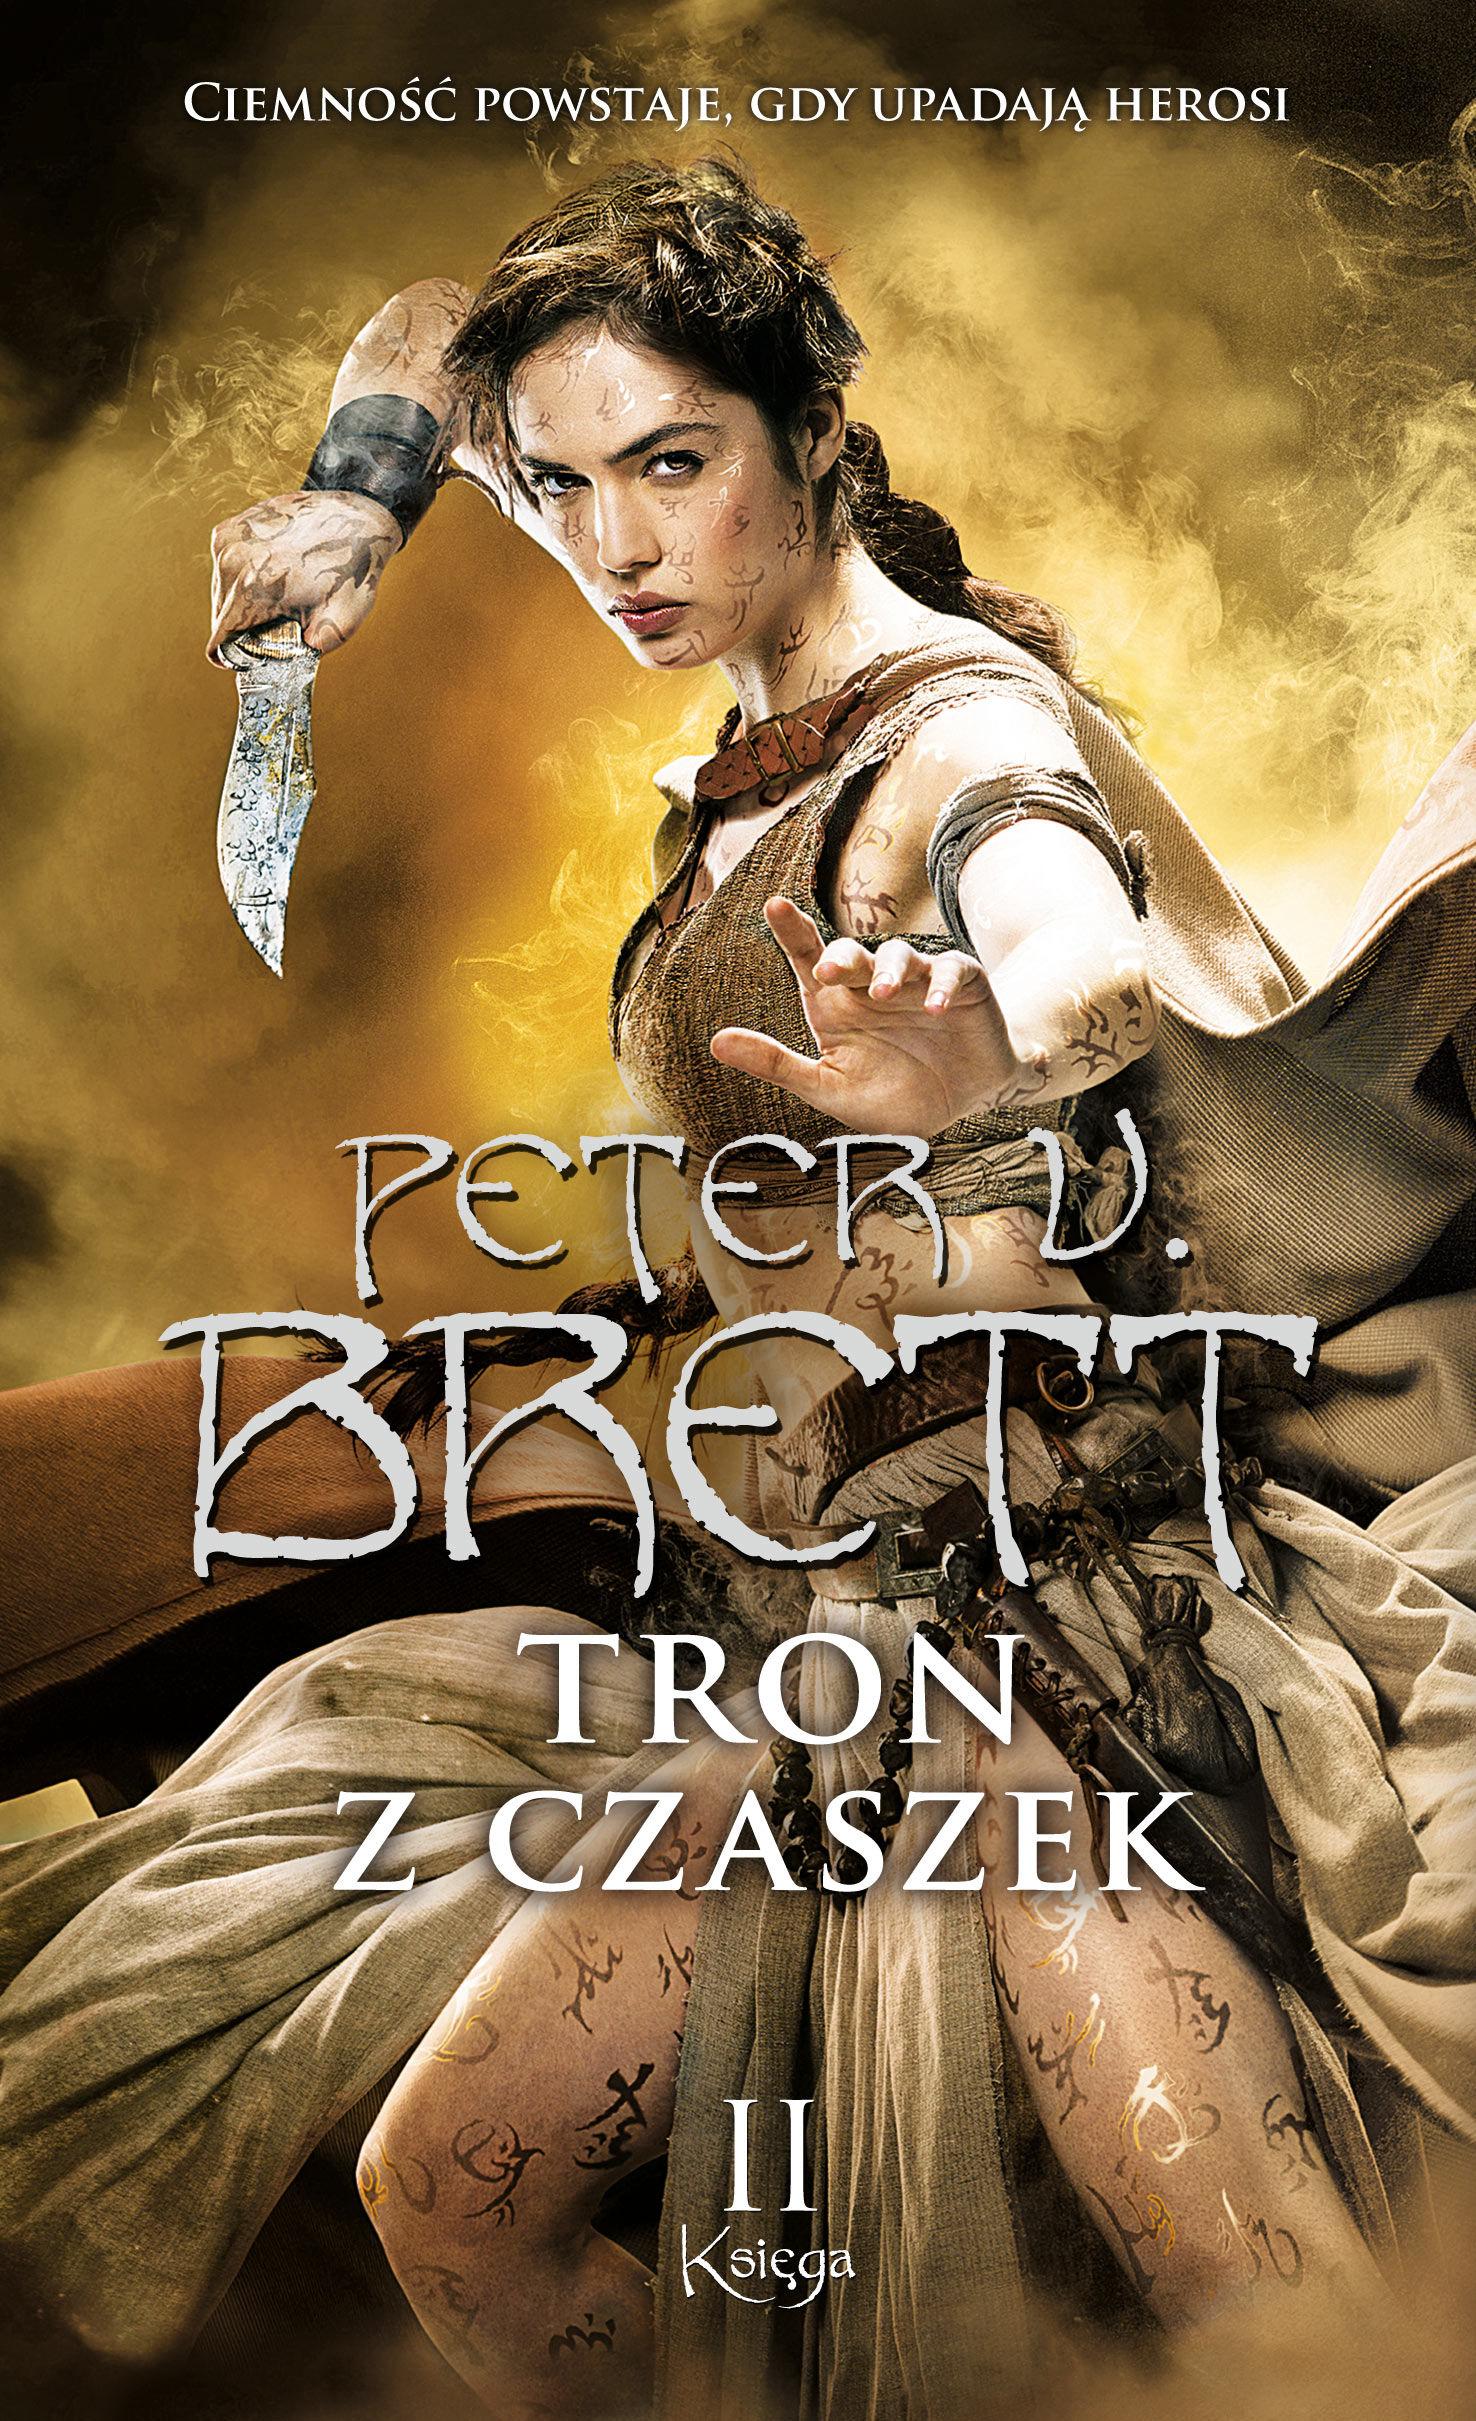 Tron z czaszek. Księga 2 - Peter V. Brett - ebook